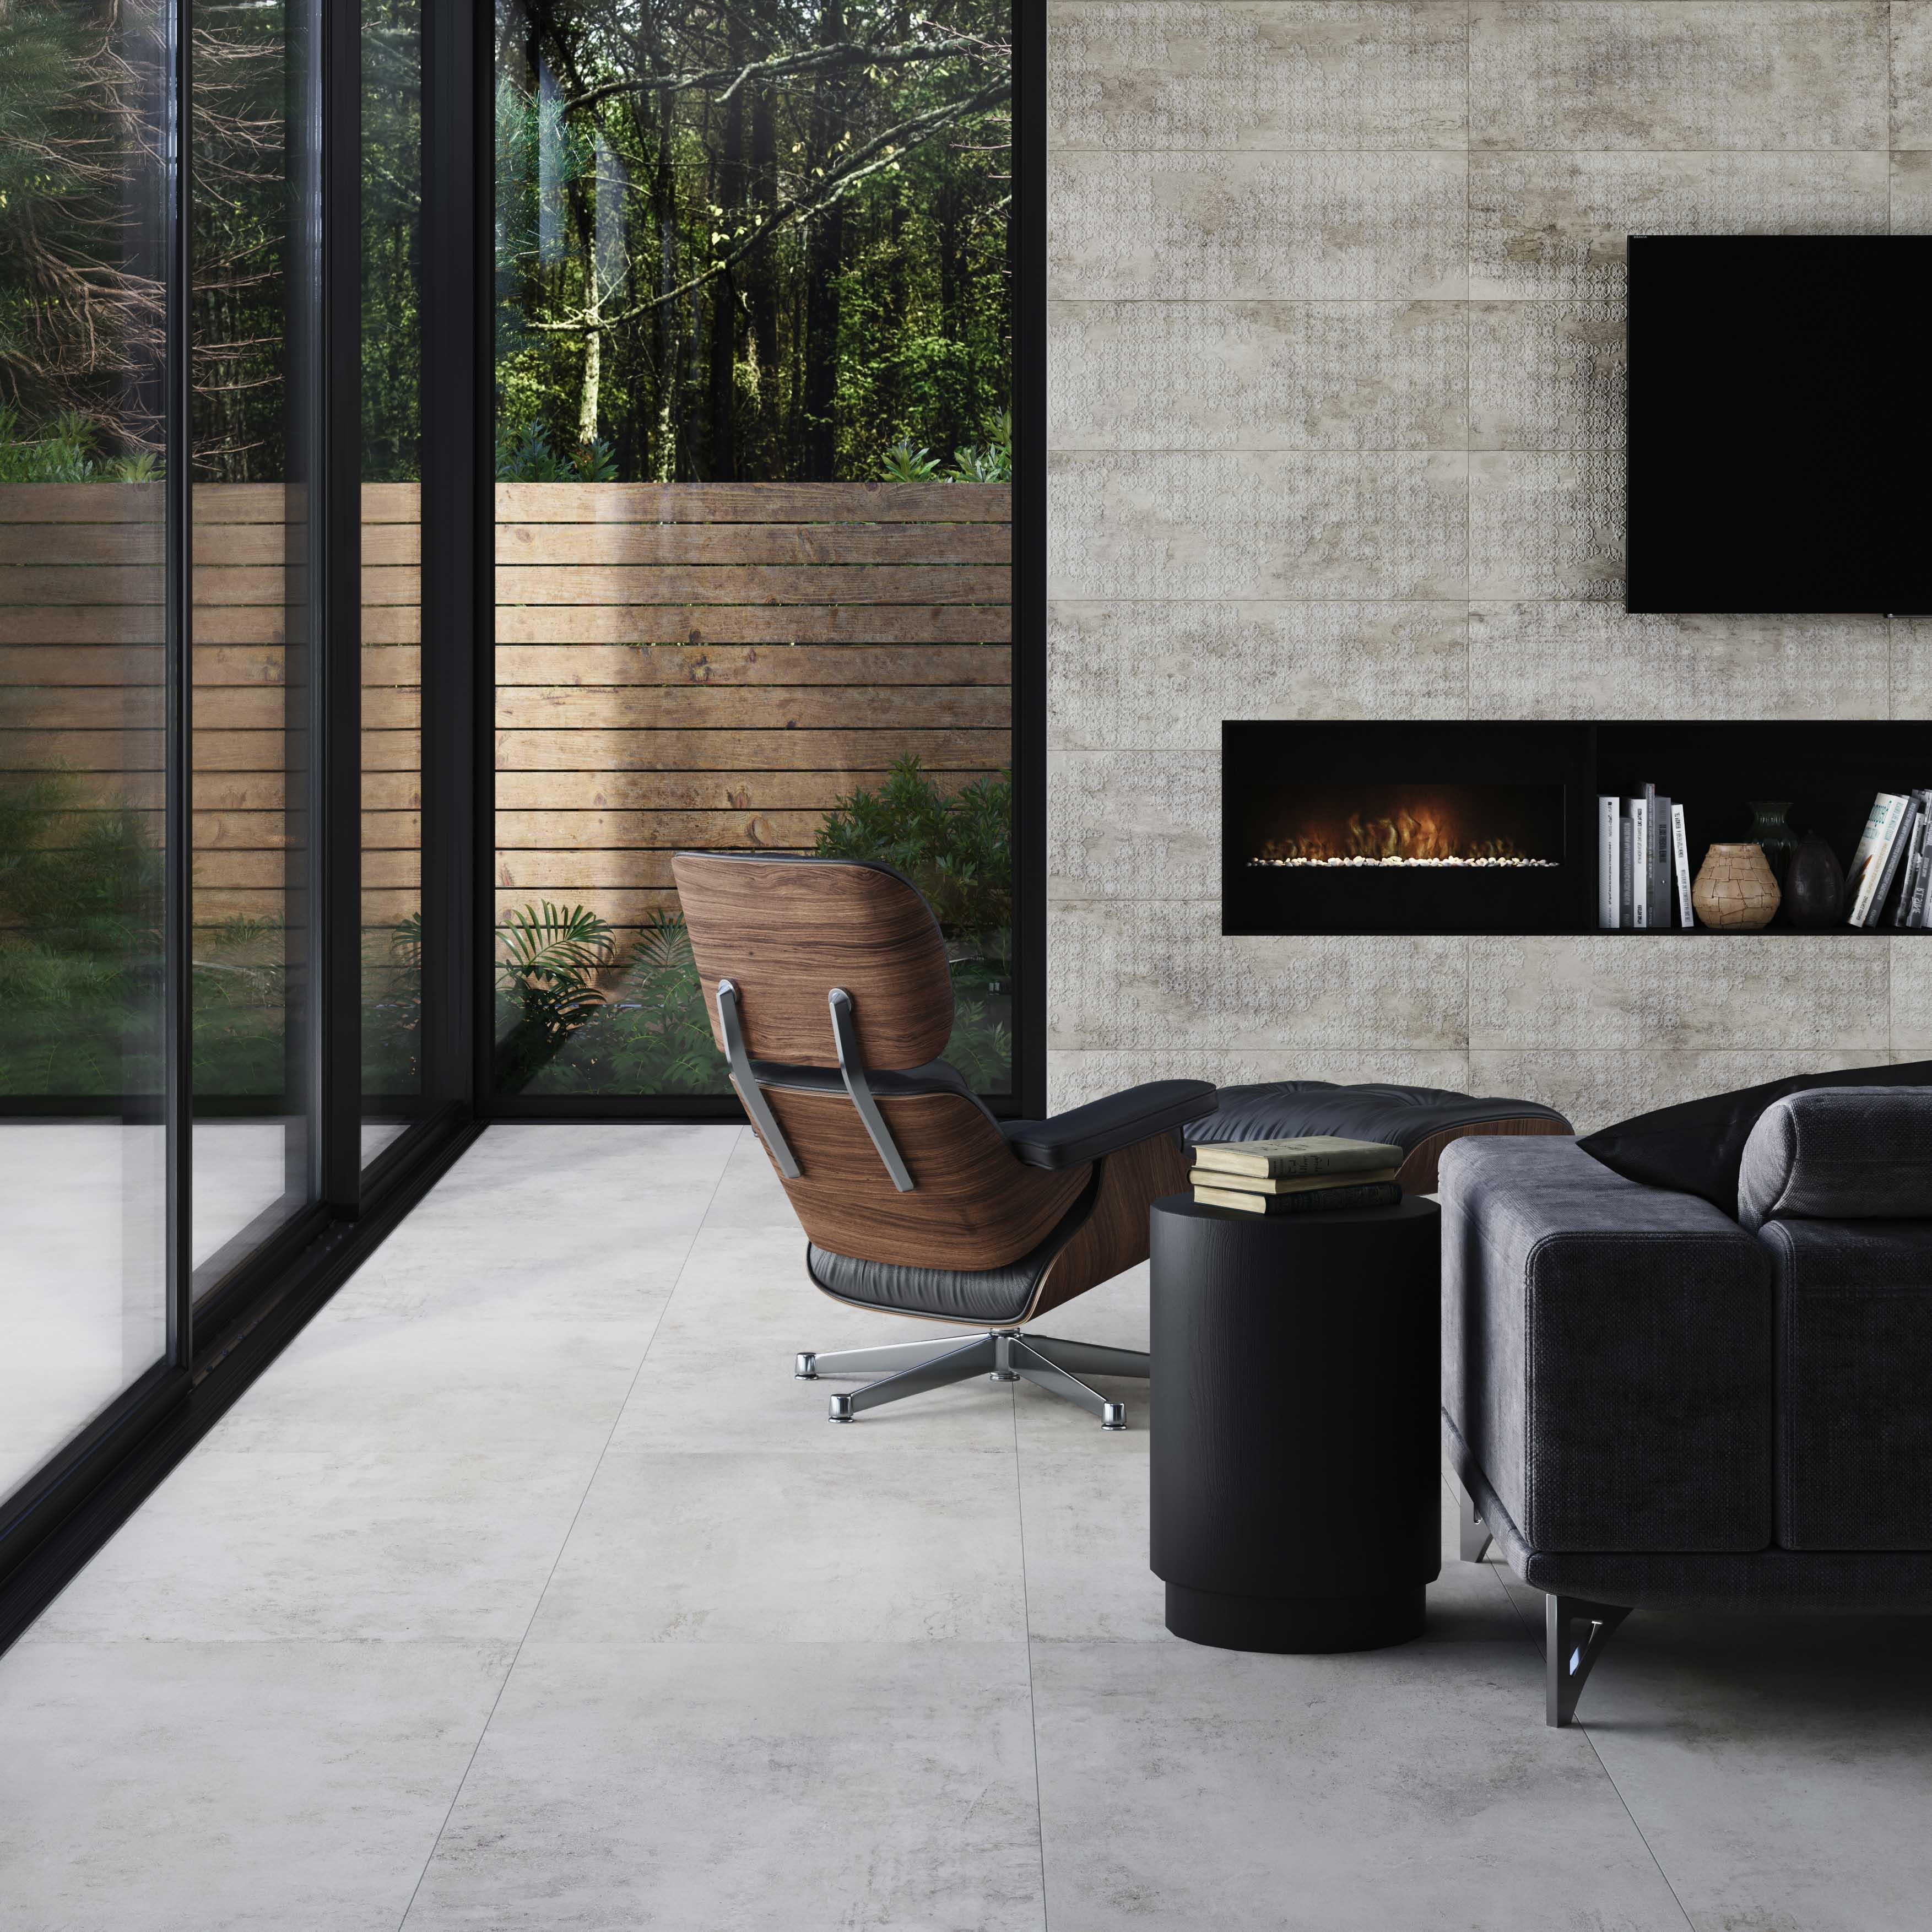 -MIDLAND SLIM GREY BLOSSOM 29,75x89,46 cm